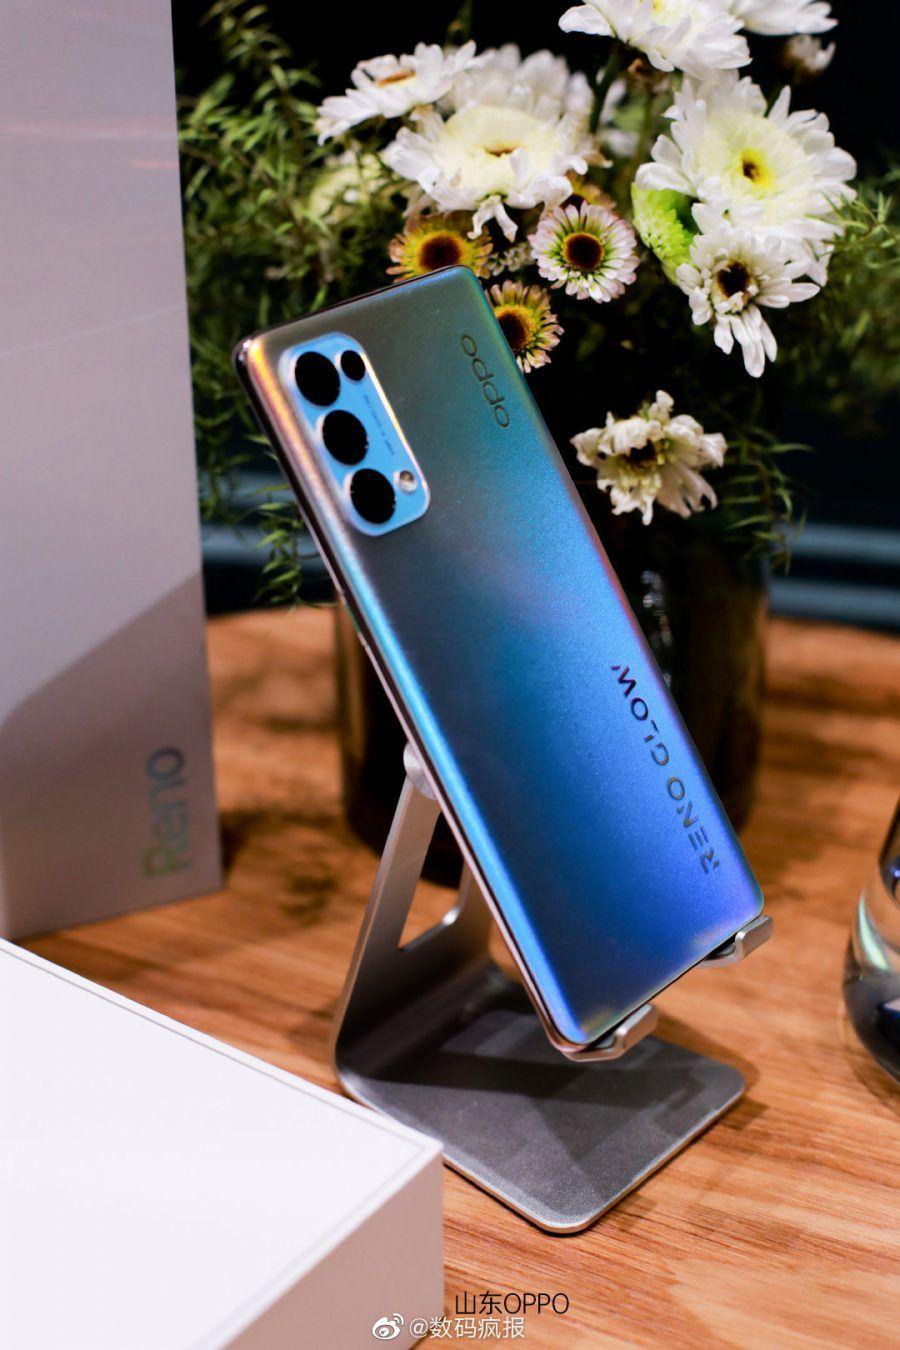 Reno5Pro 6 Android 11, china, gama-média, imagens reais, oppo, OPPO Reno 5, Reno 5 Pro, smartphone, topo de gama